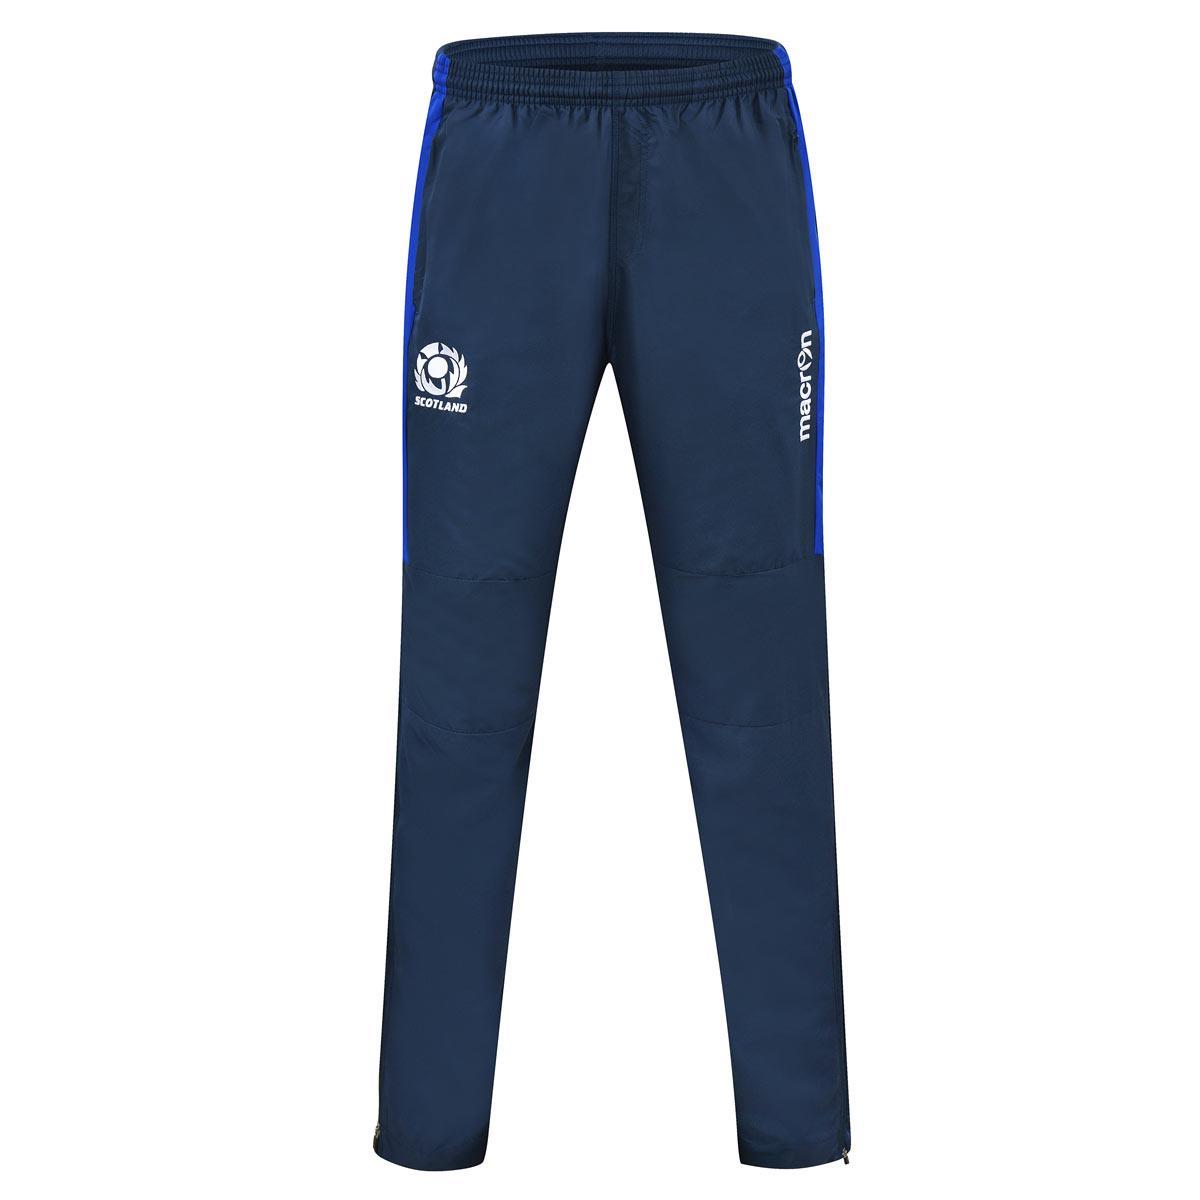 2016-2017 Scotland Macron Rugby Microfibre Travel Pants (Navy) - Kids